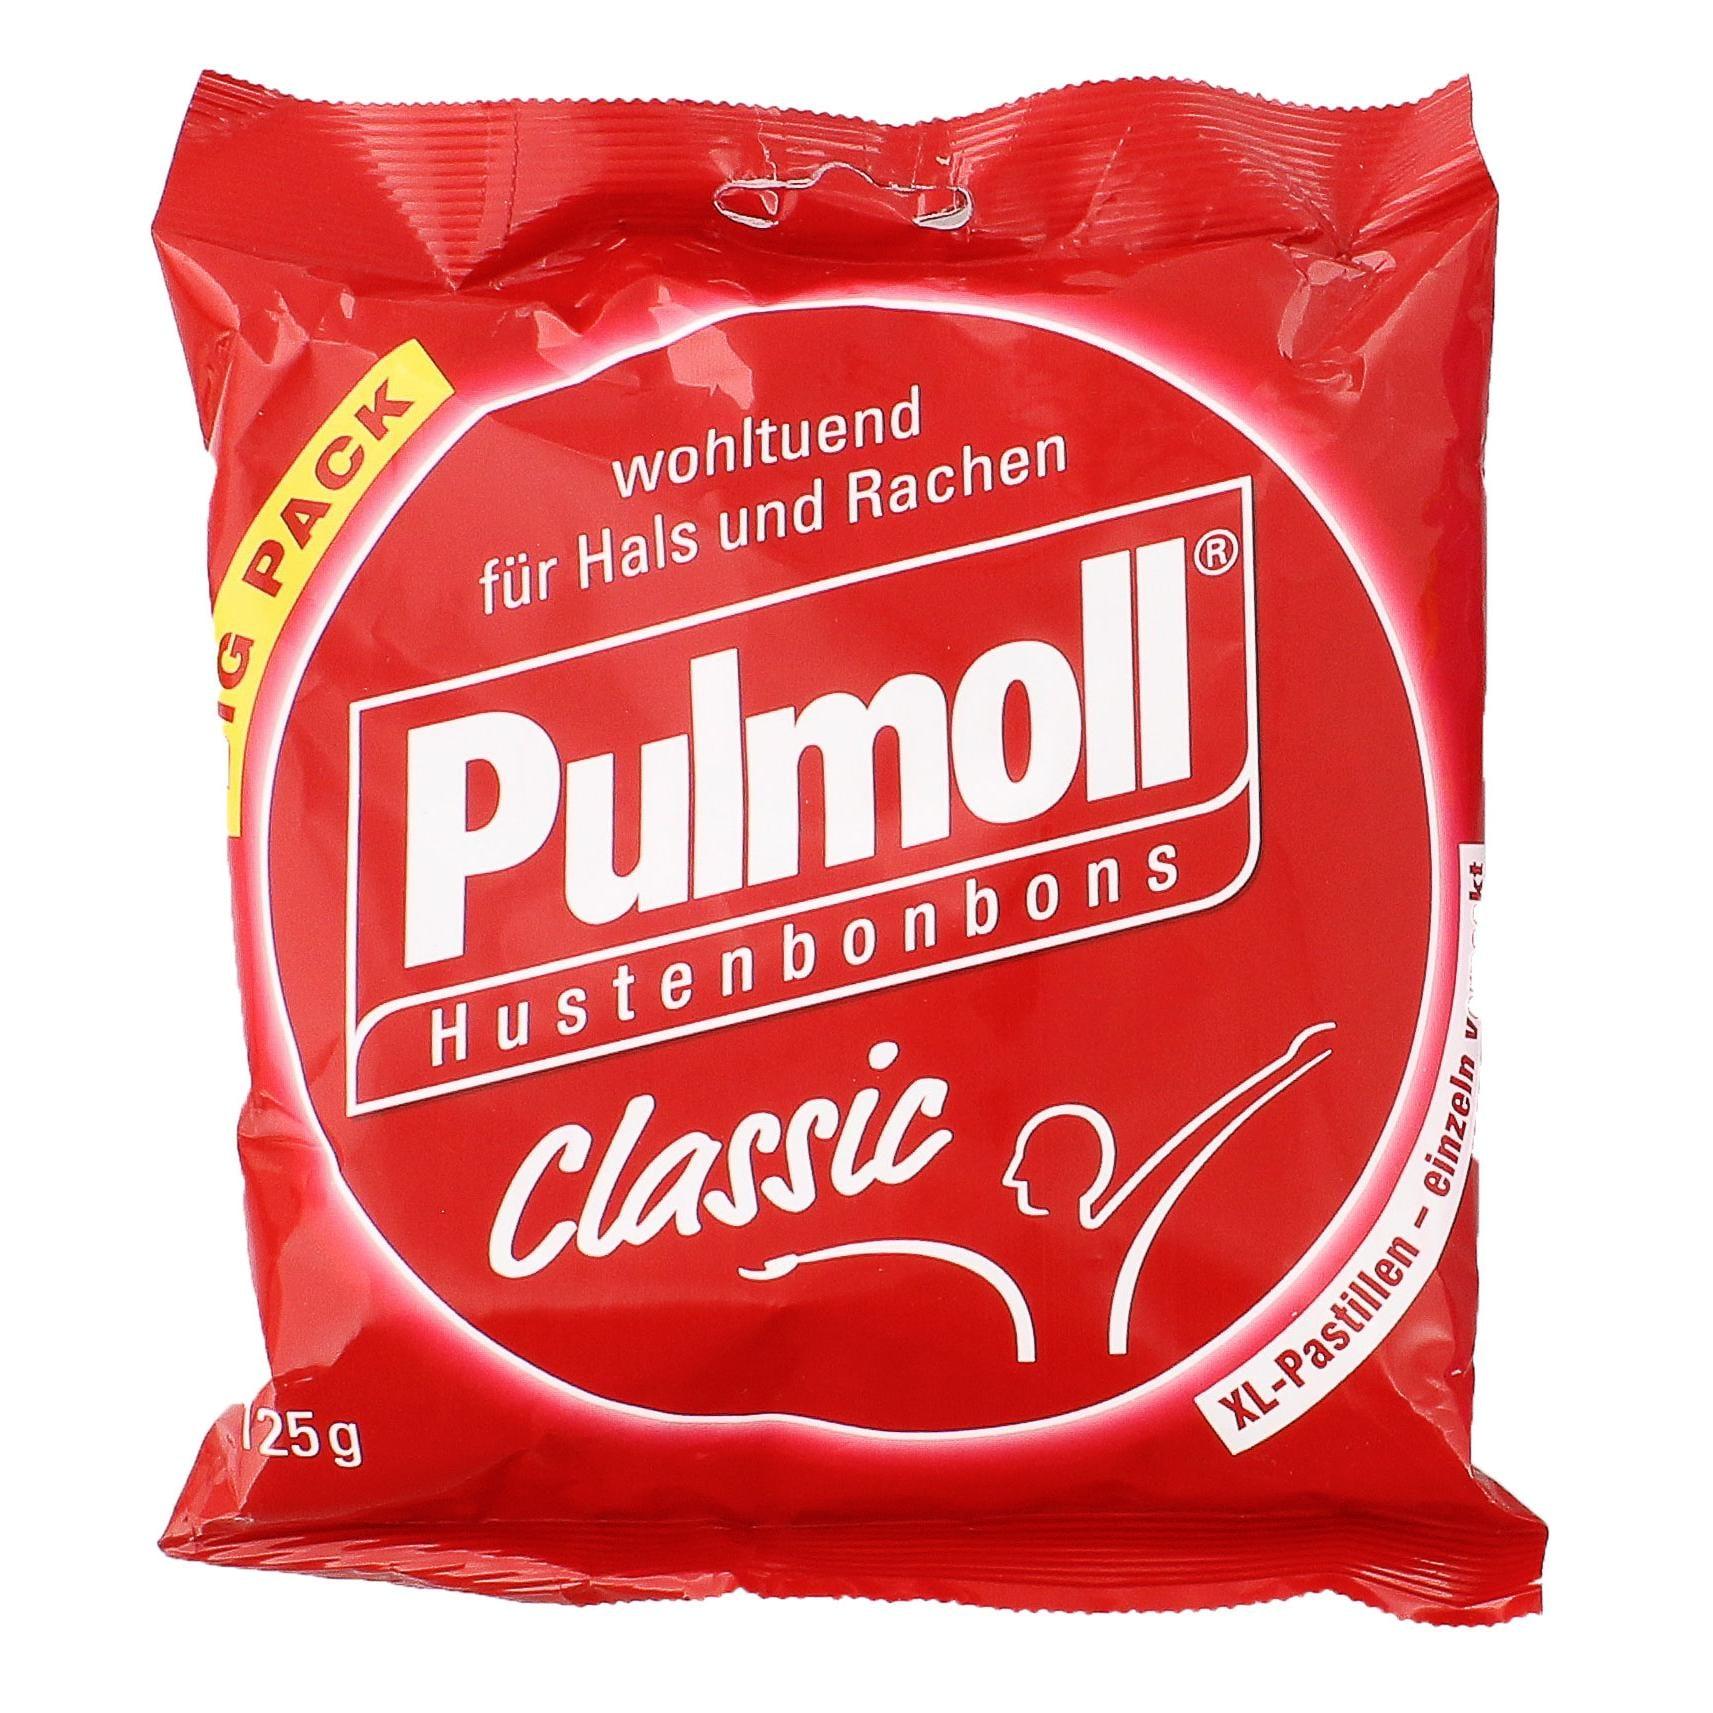 Pulmoll Classic - Hustenbonbons - 125g